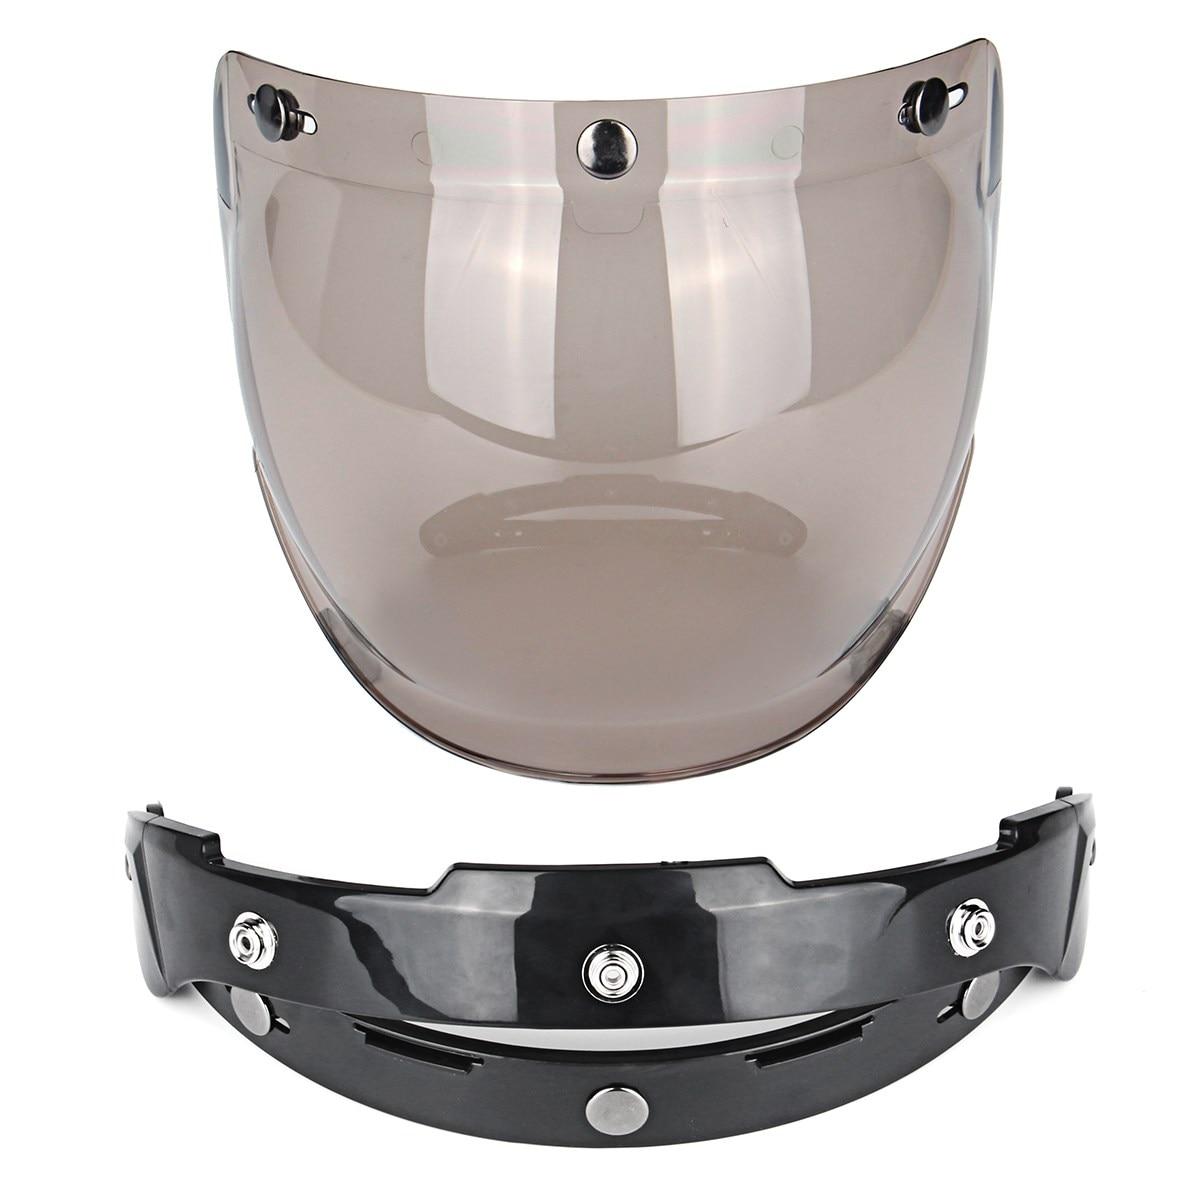 3 Snap Sunglasses Motorcycle font b Helmet b font Bubble Visor Lens Windproof Retro Motorbike Bubble